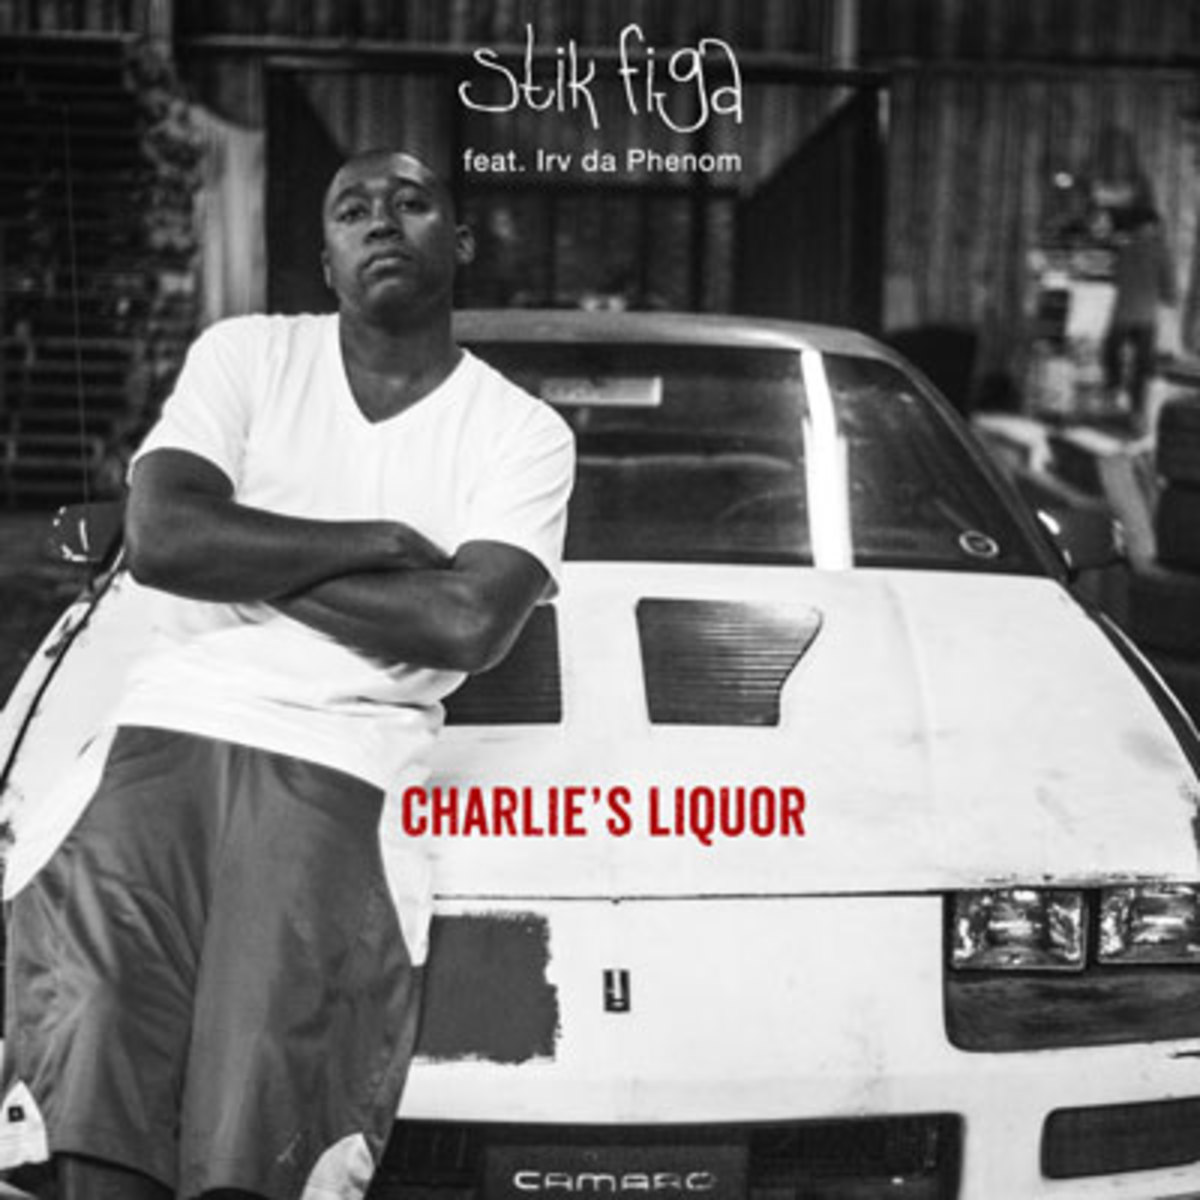 stikfiga-charliesliquor.jpg